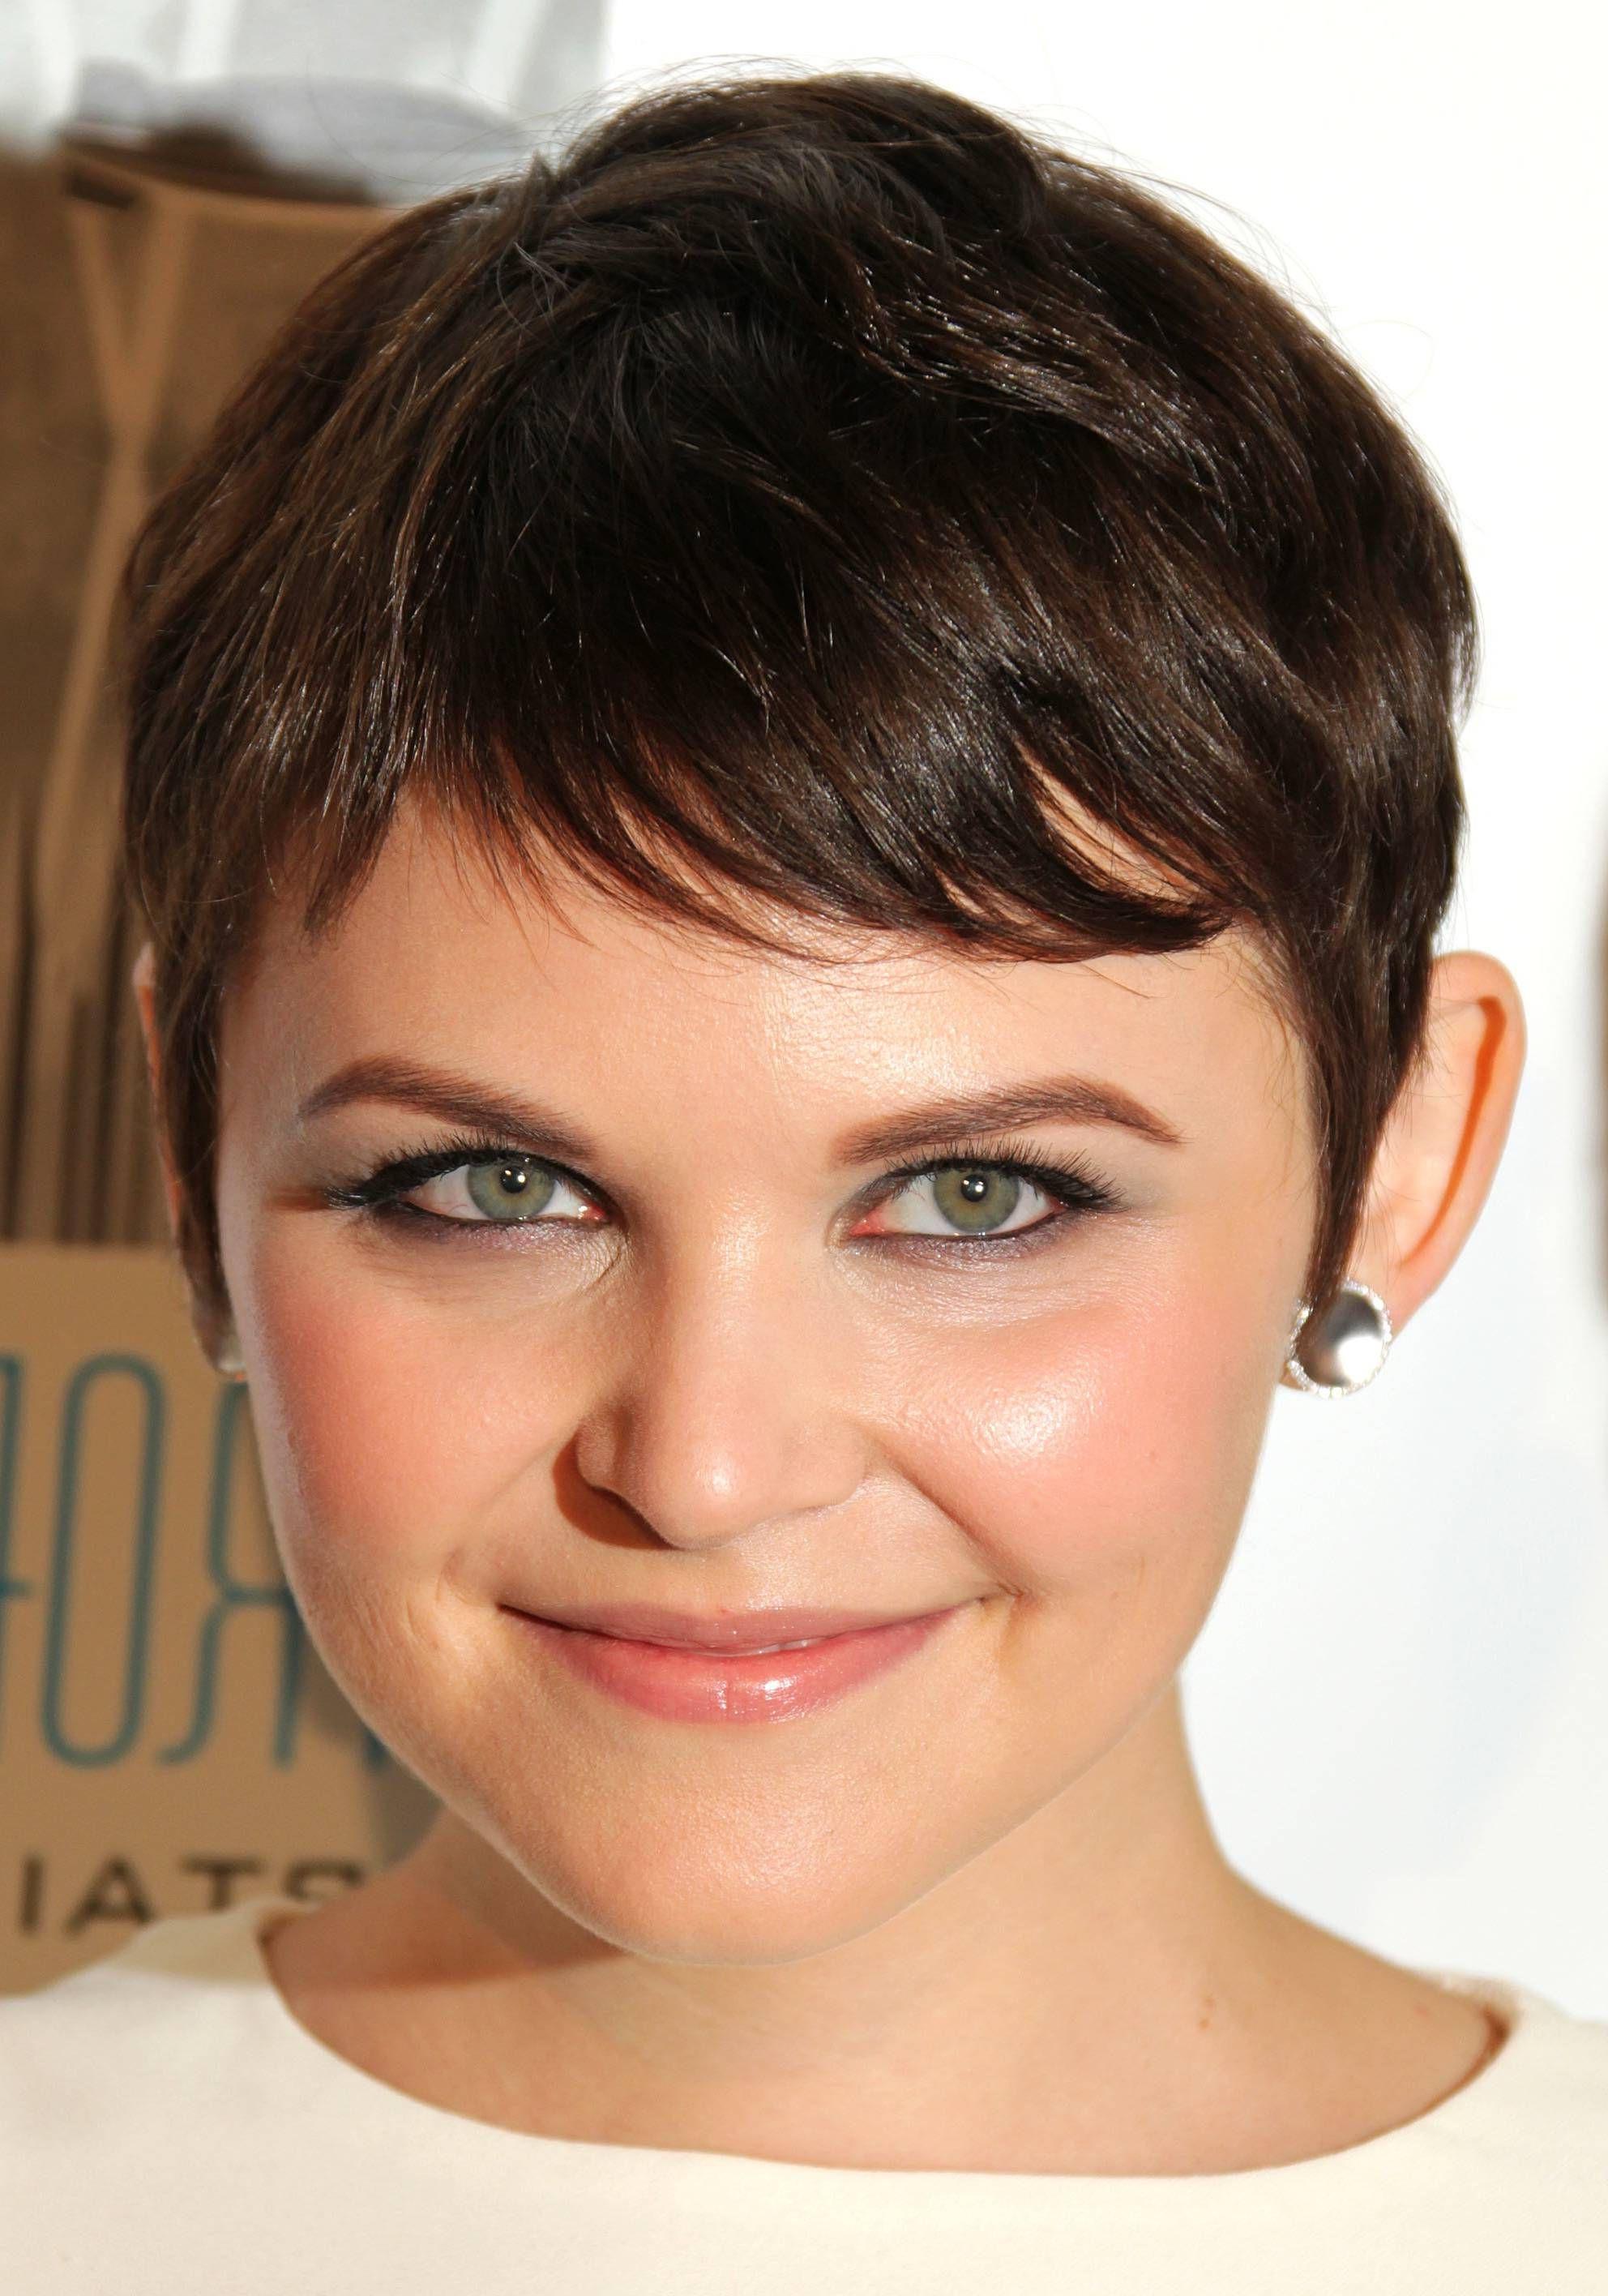 Short Female Haircuts – Hairstyle For Women & Man Regarding Short Female Hair Cuts (View 14 of 25)